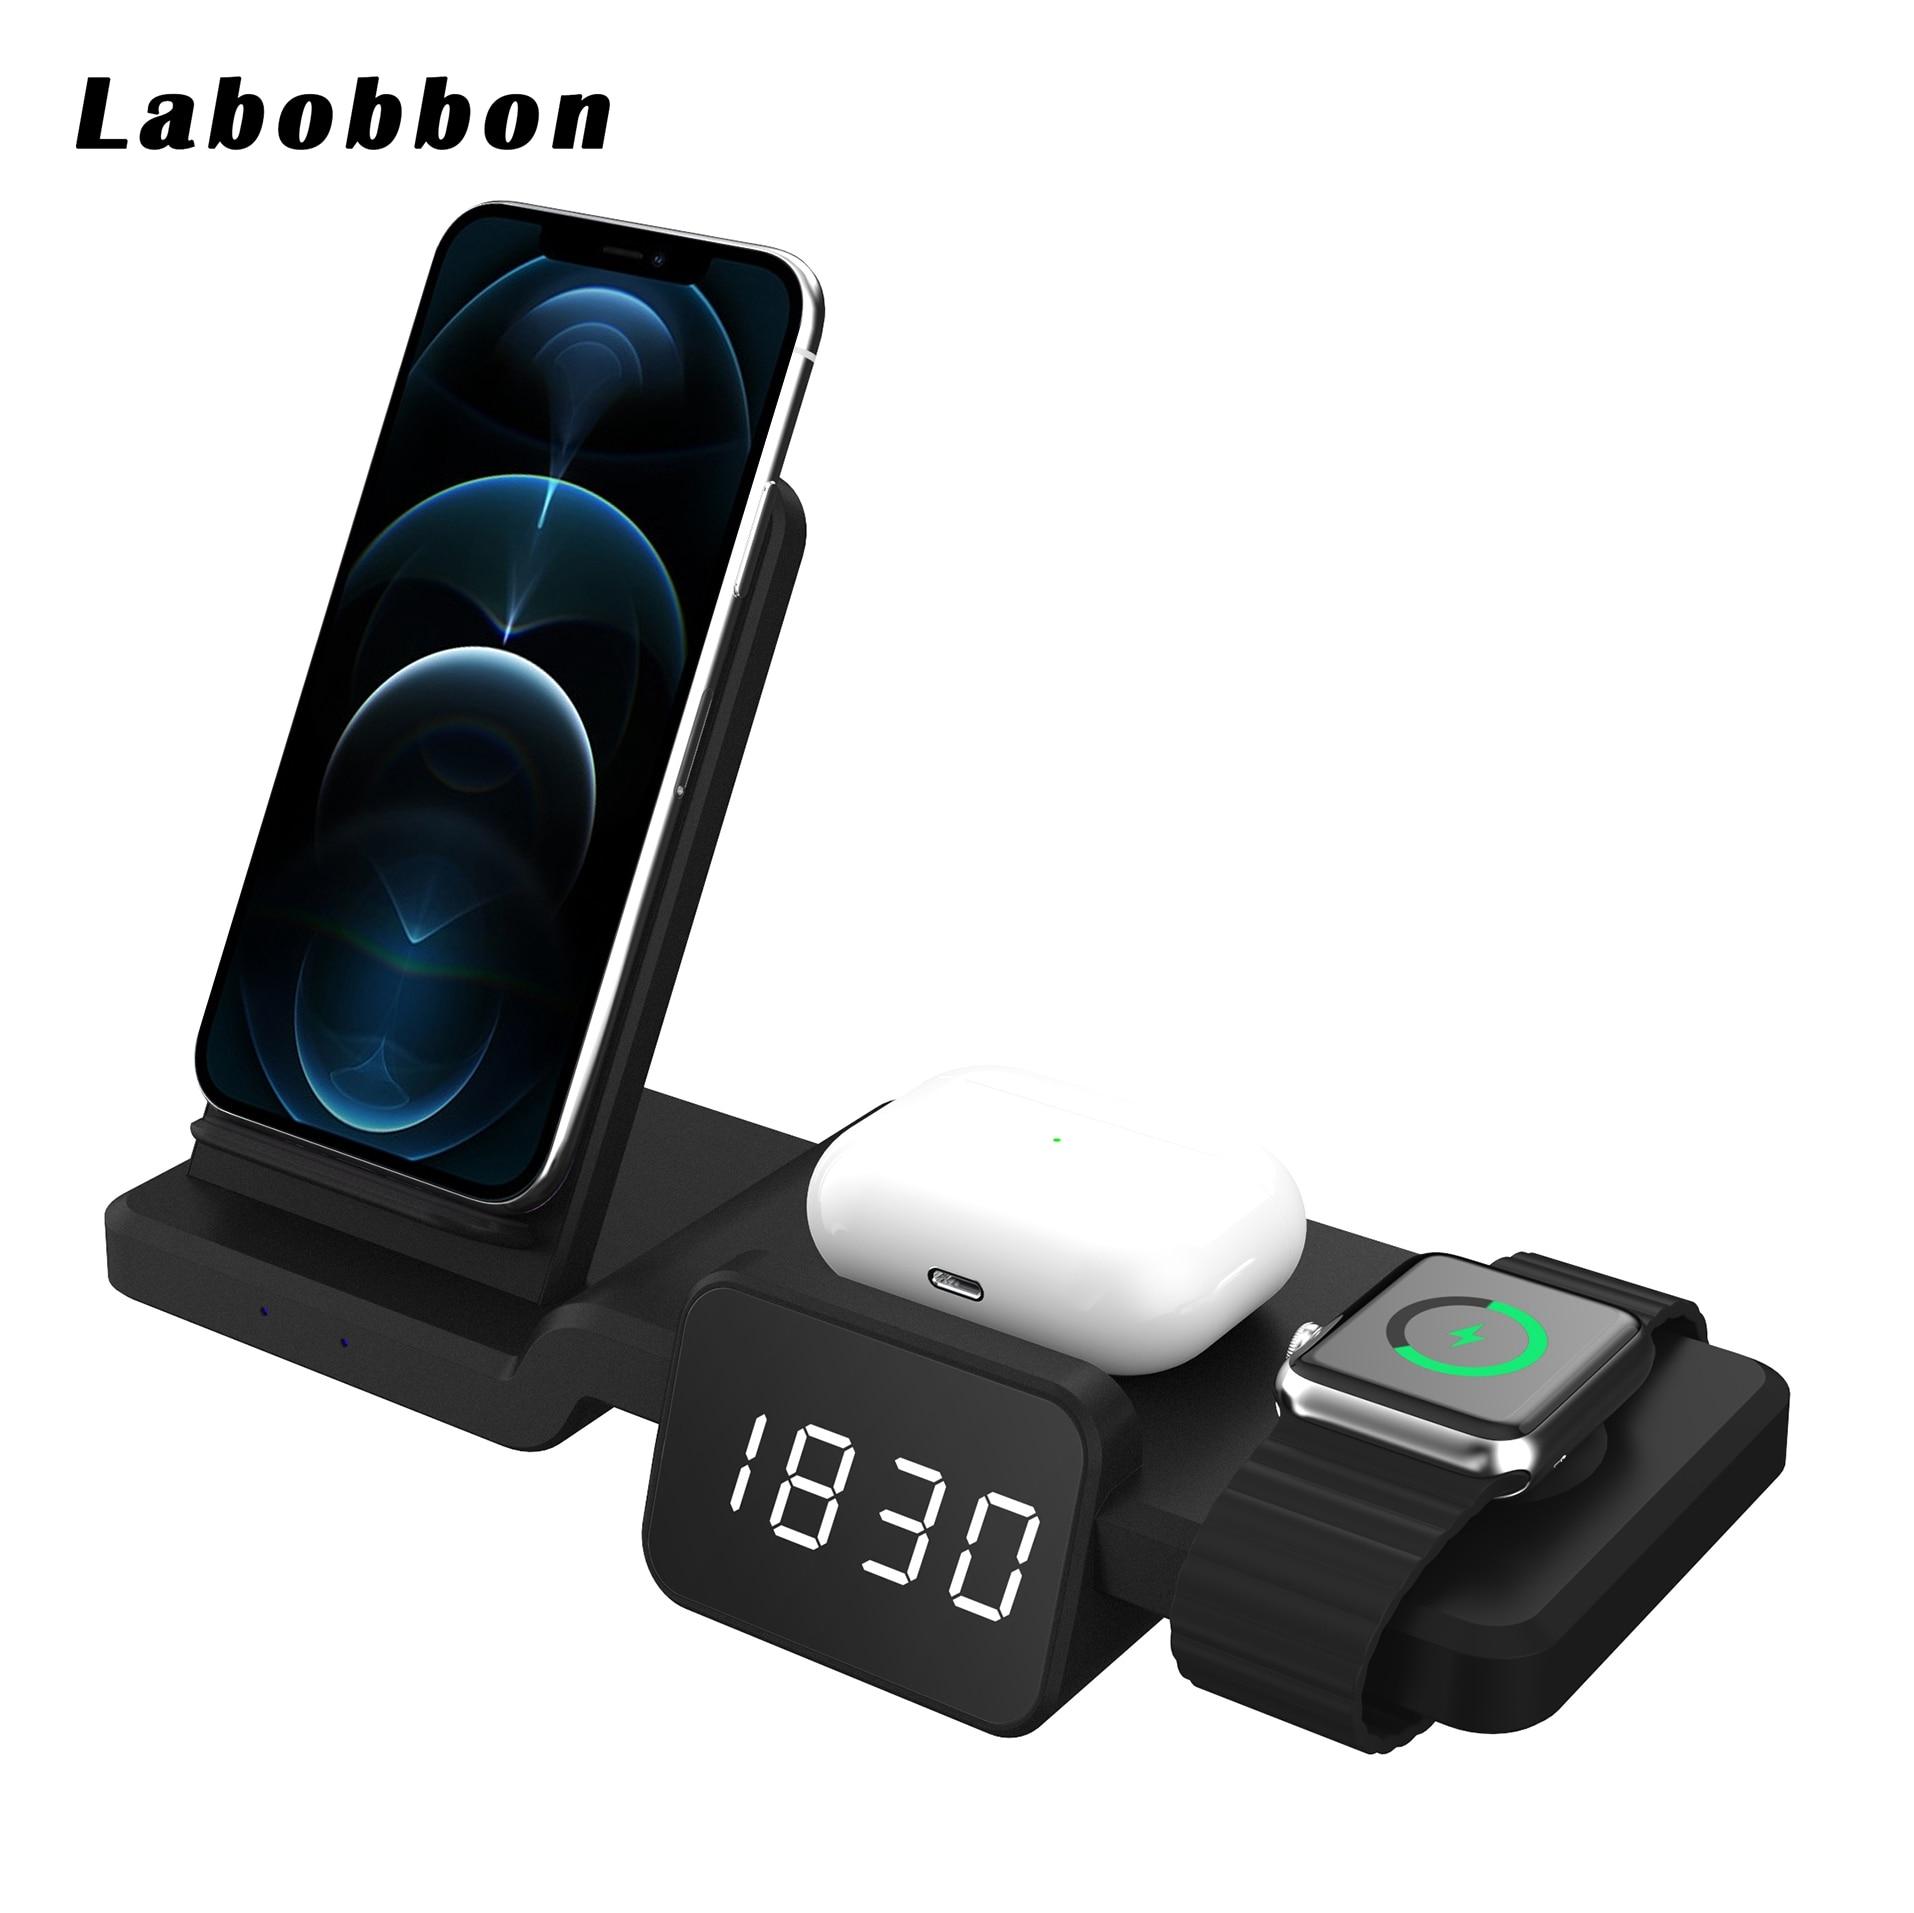 Labobbon 5 in1 تشى شاحن لاسلكي ل أبل ساعة 6 5 4 3 2 شحن سريع حوض محطة آيفون 8 Pus X XS XR 11 برو ماكس 12